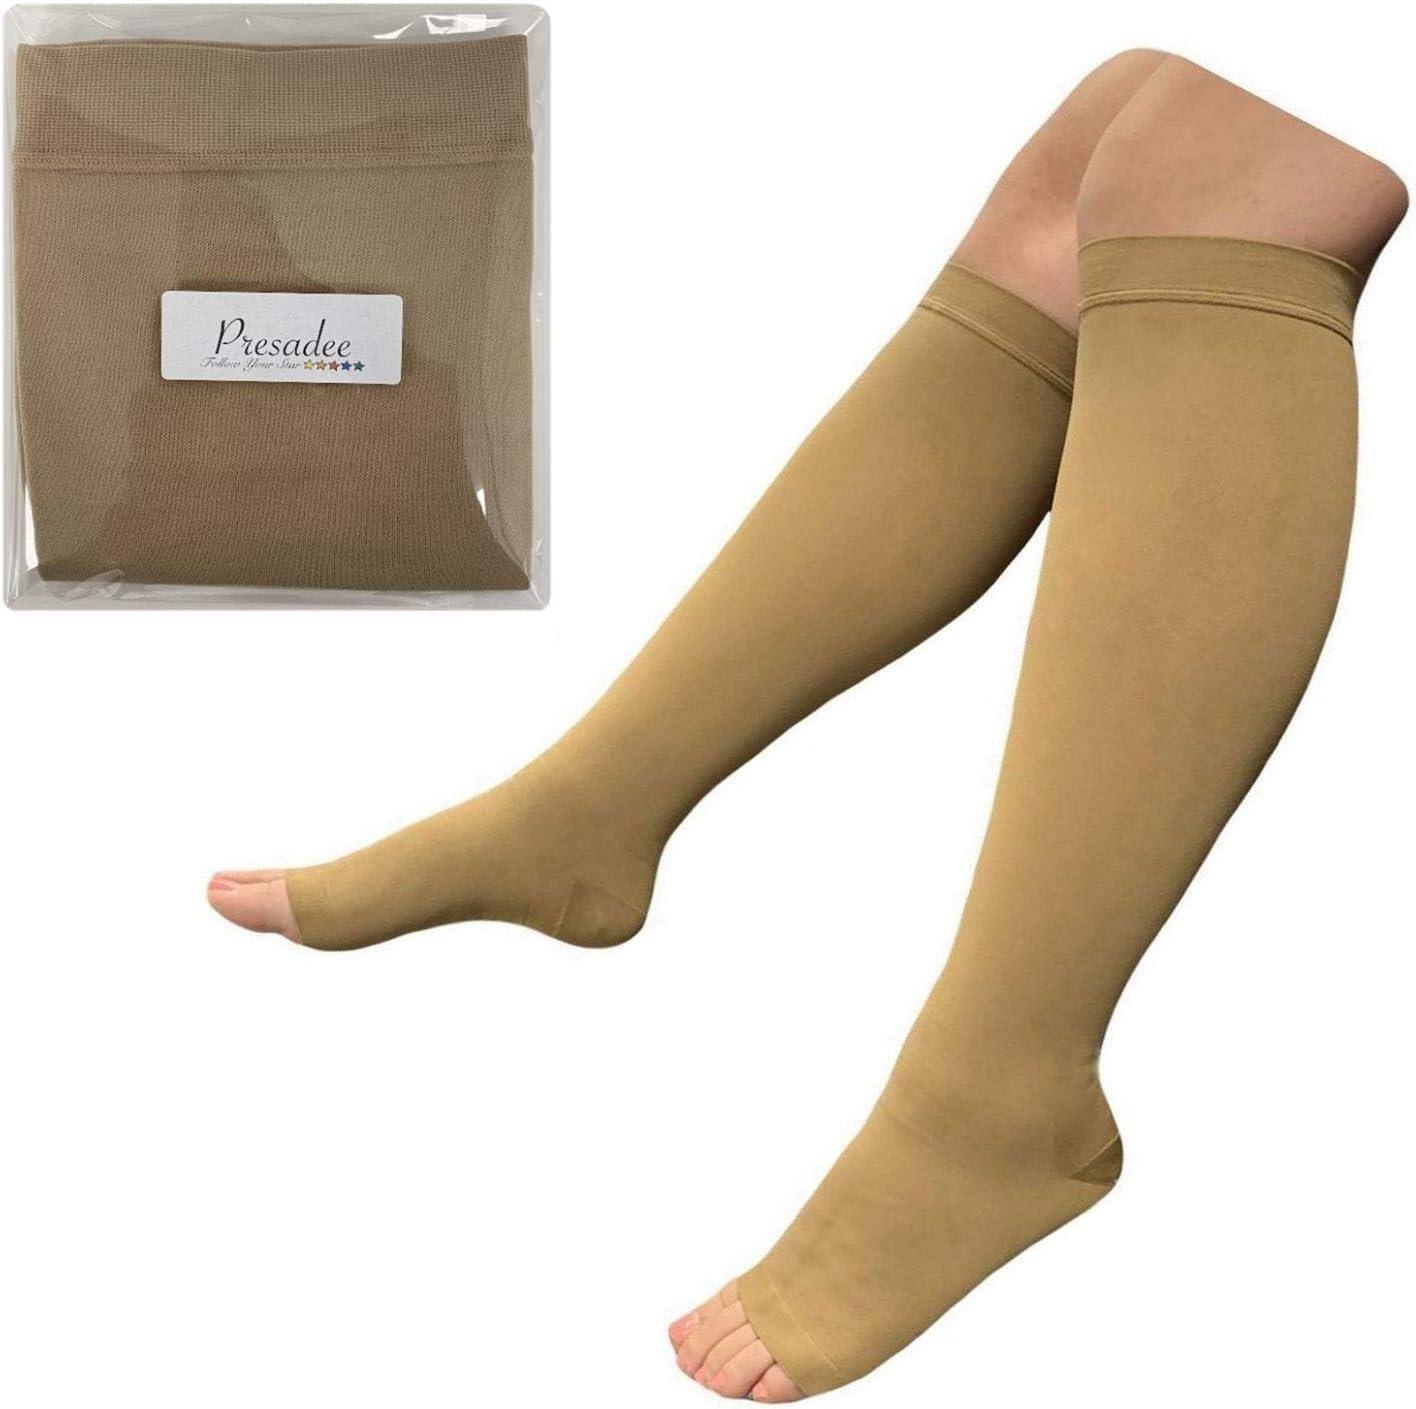 Presadee Traditional 30-40 mmHg X-Firm Compression Medical Leg Open Toe Socks Black, 4X-Large